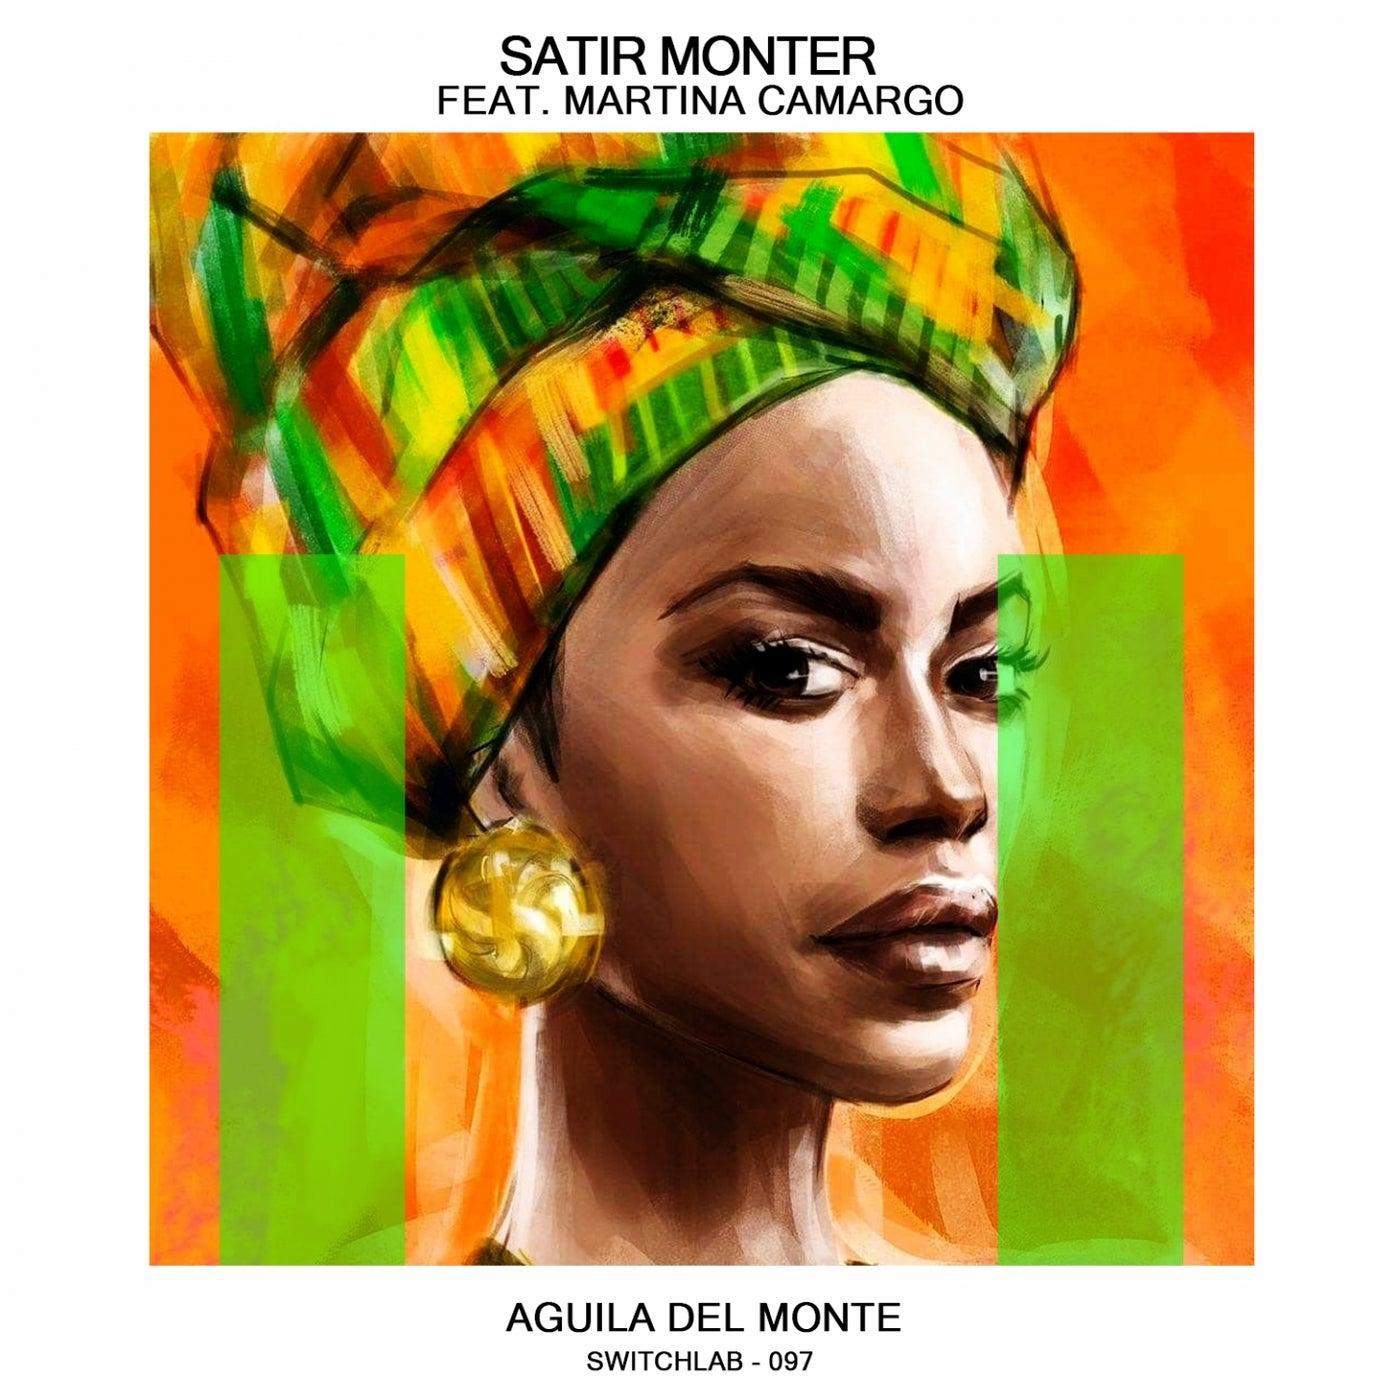 Aquila del Monte feat. Martina Camargo (Original Mix)